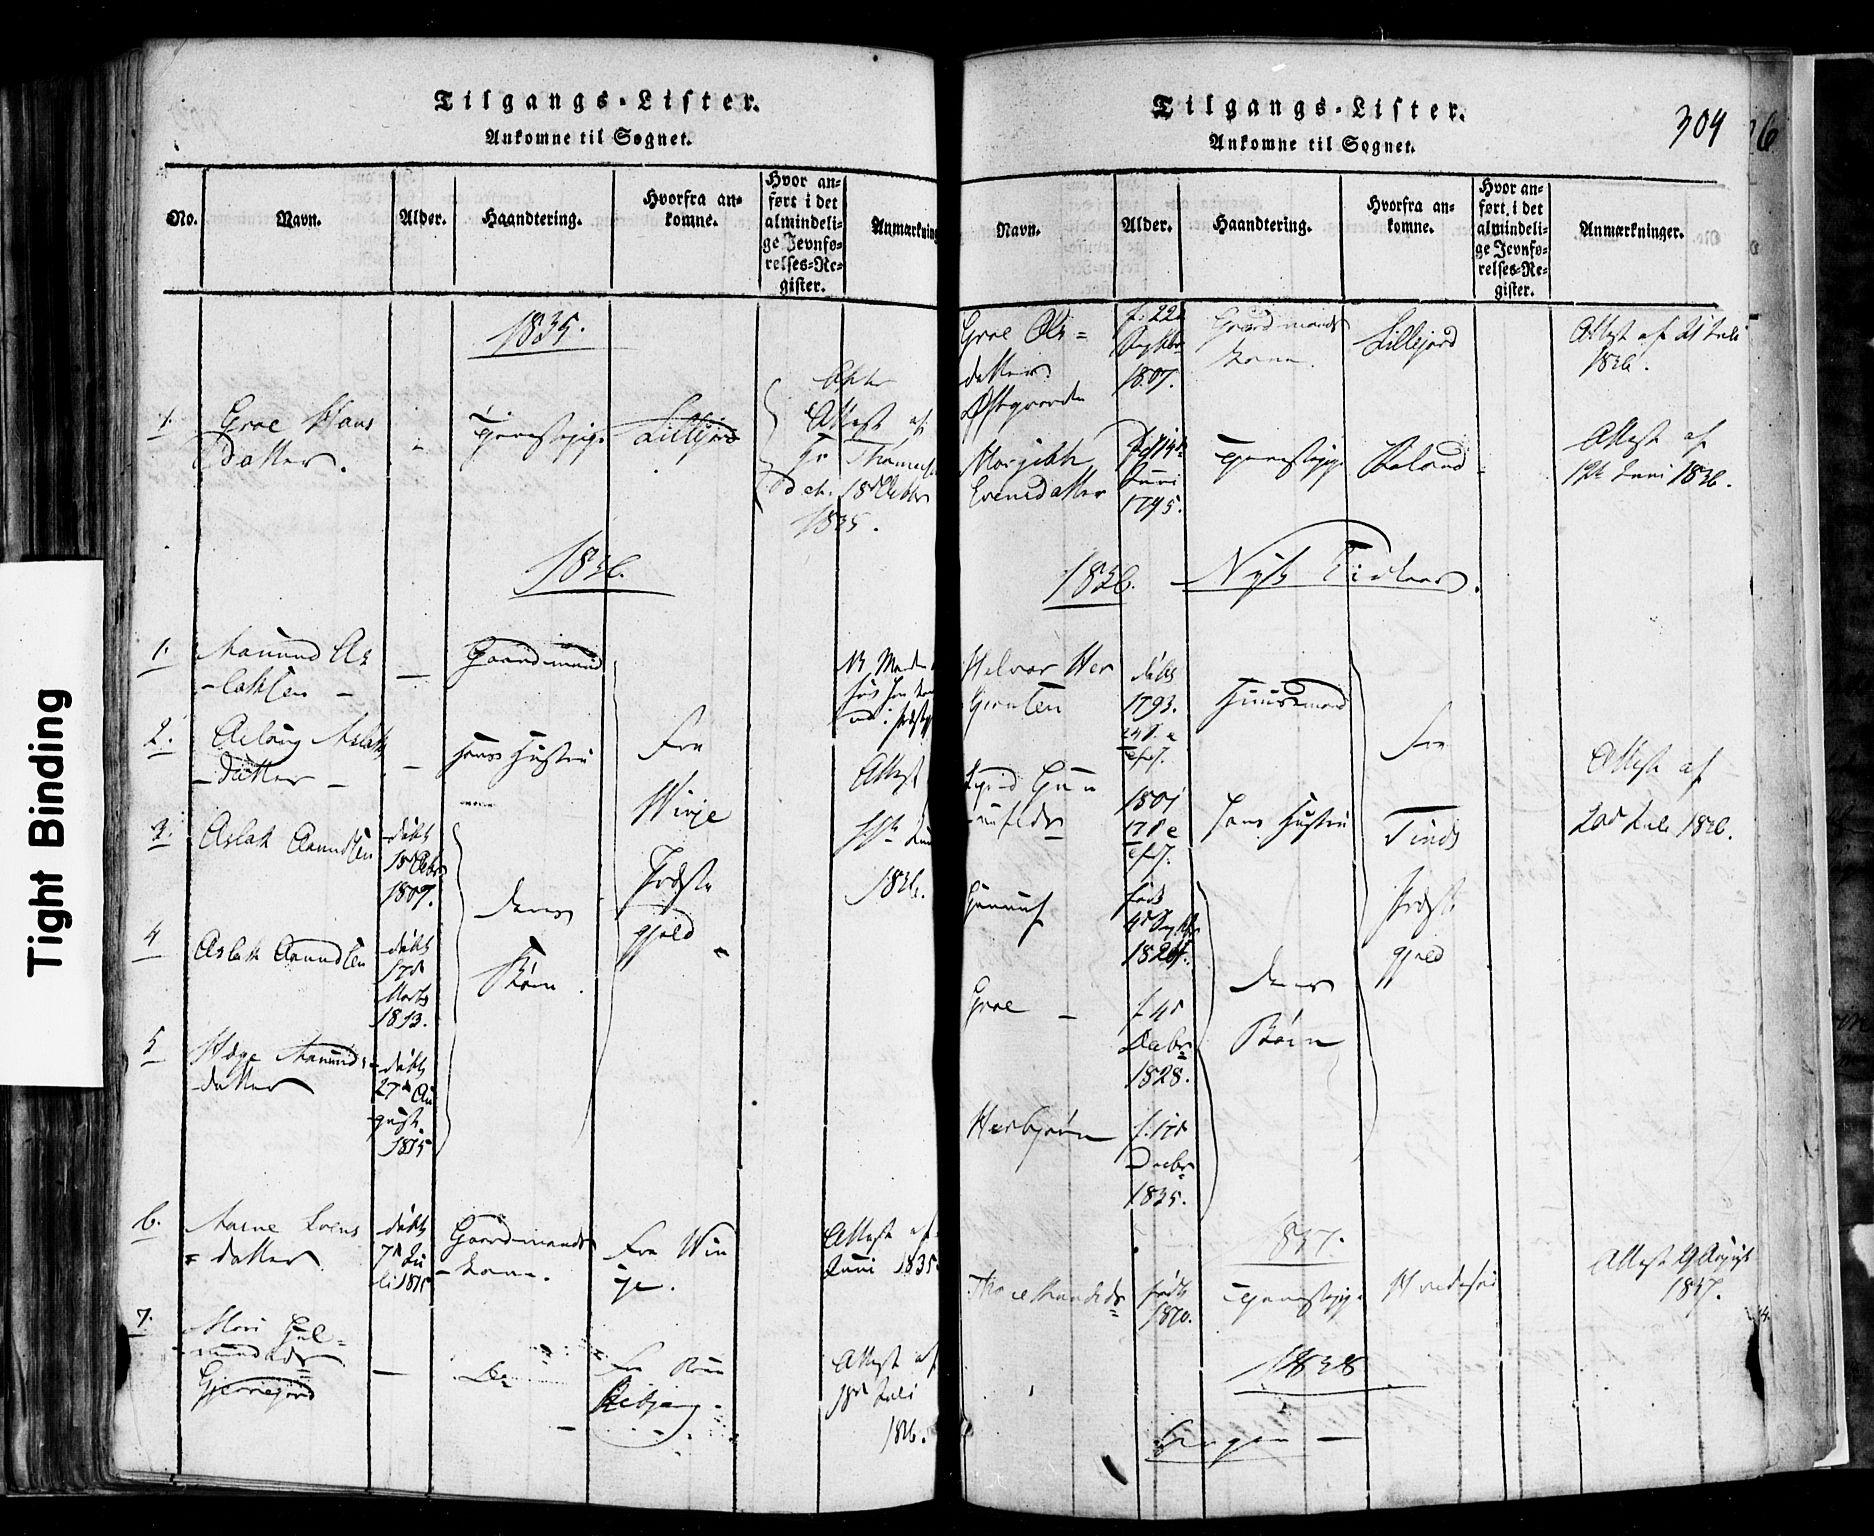 SAKO, Rauland kirkebøker, F/Fa/L0002: Ministerialbok nr. 2, 1815-1860, s. 304